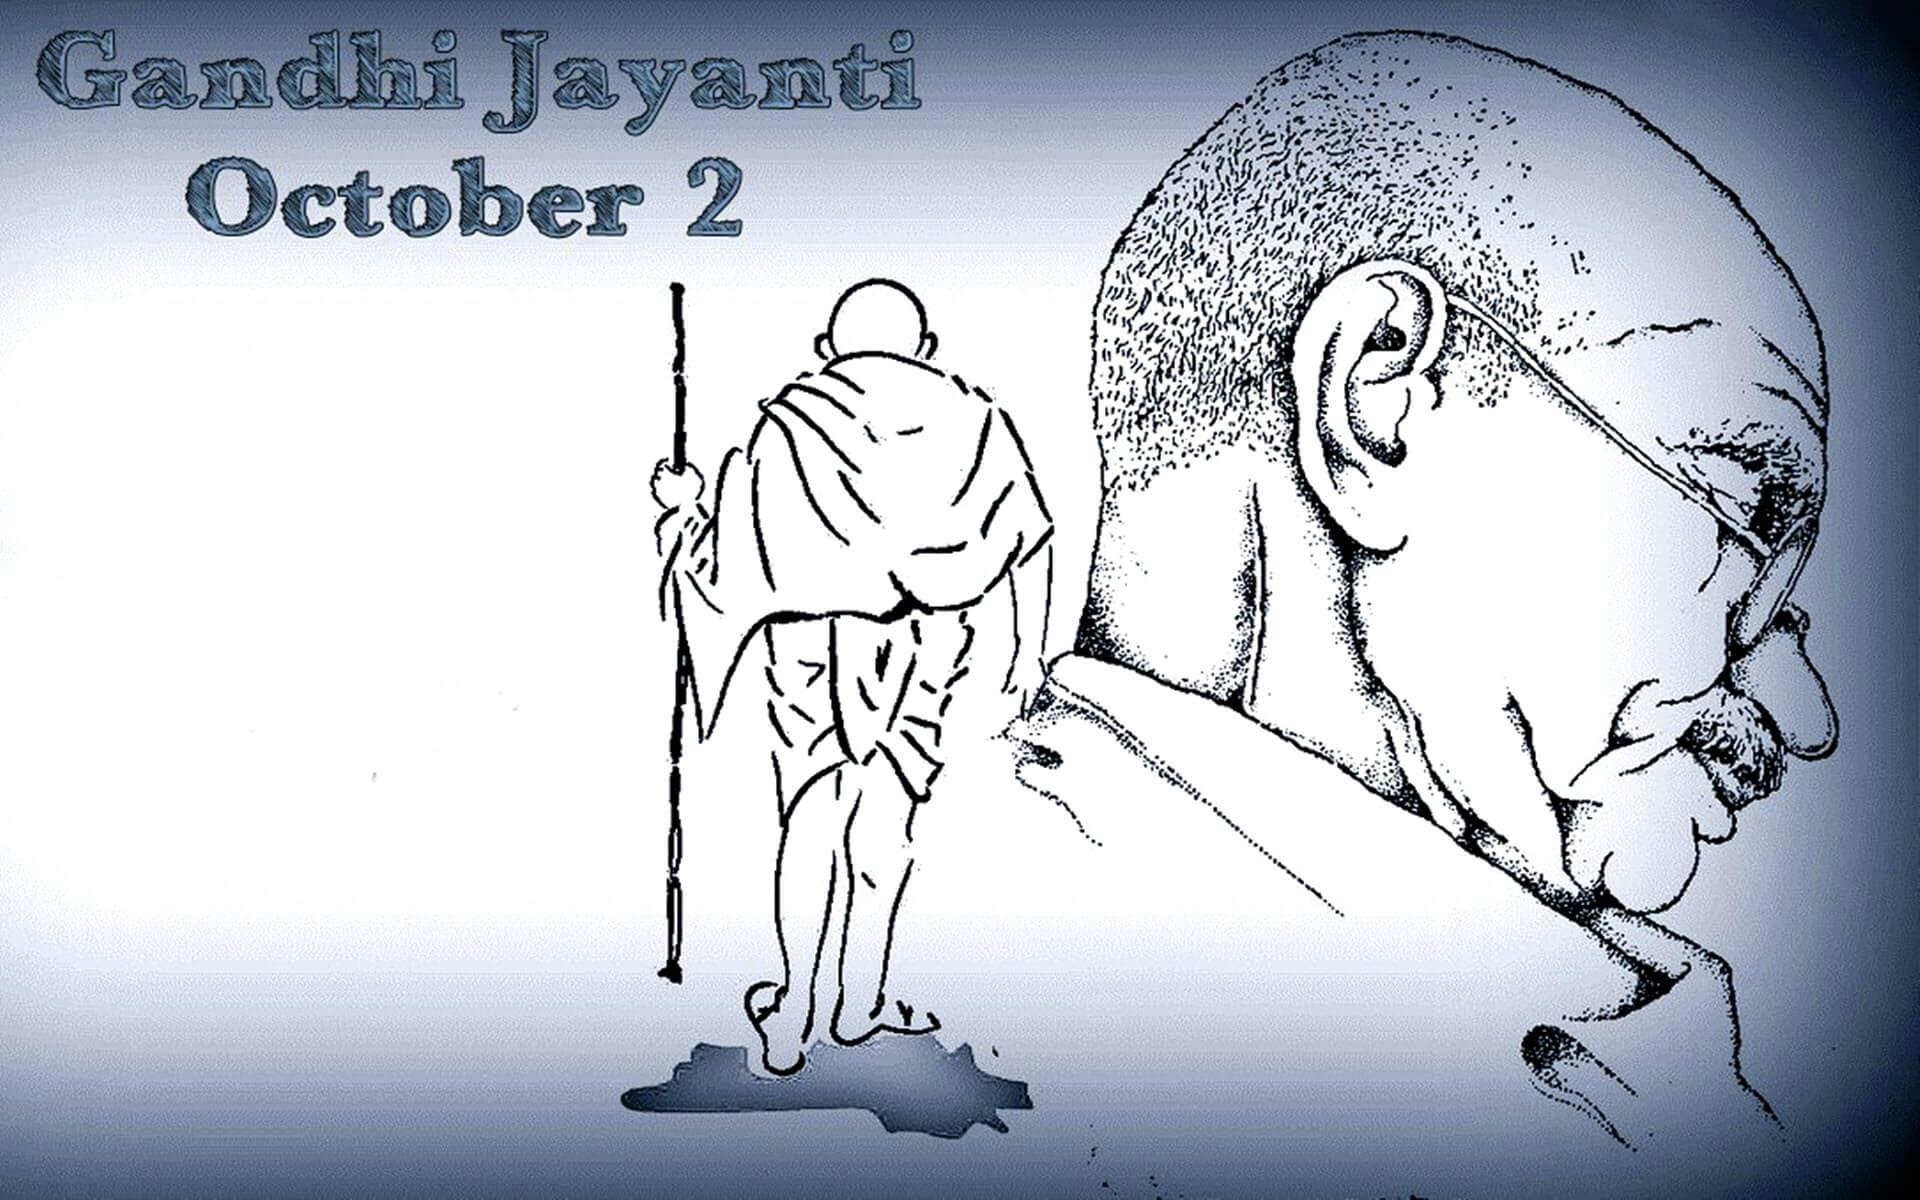 mahatma gandhi jayanti october 2 latest hd wallpaper